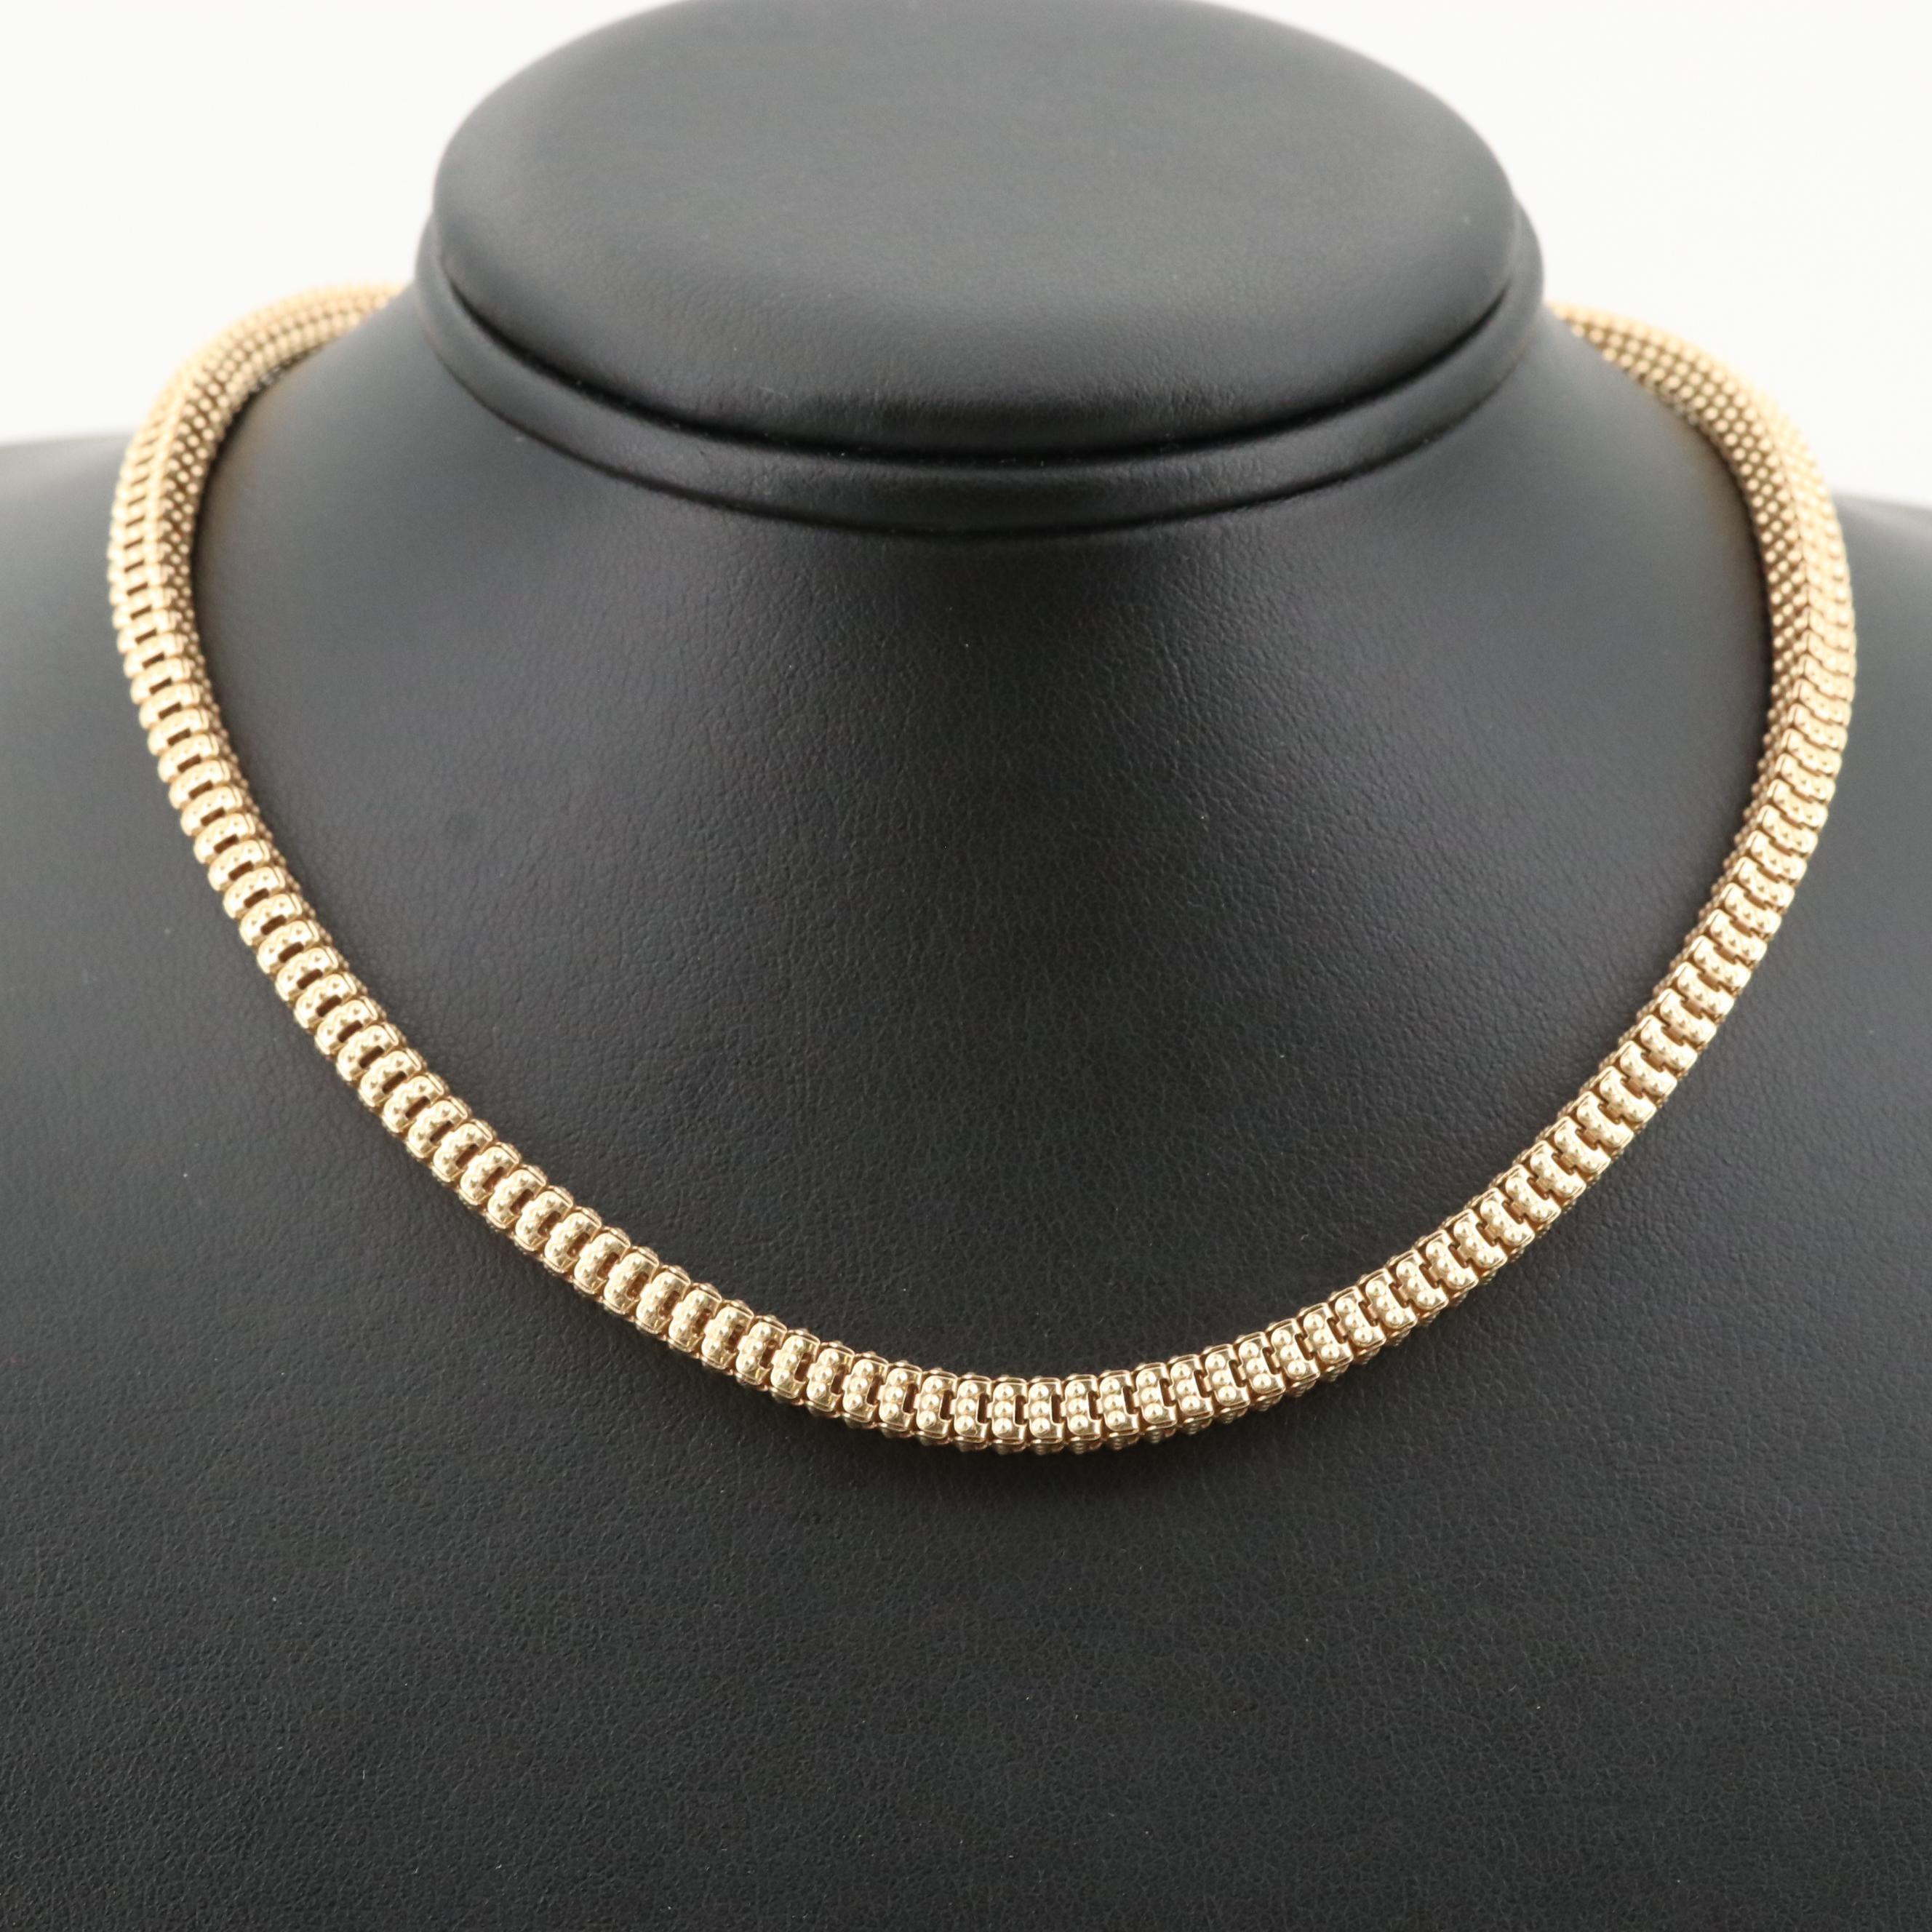 Italian 14K Yellow Gold Fancy Link Box Chain Necklace